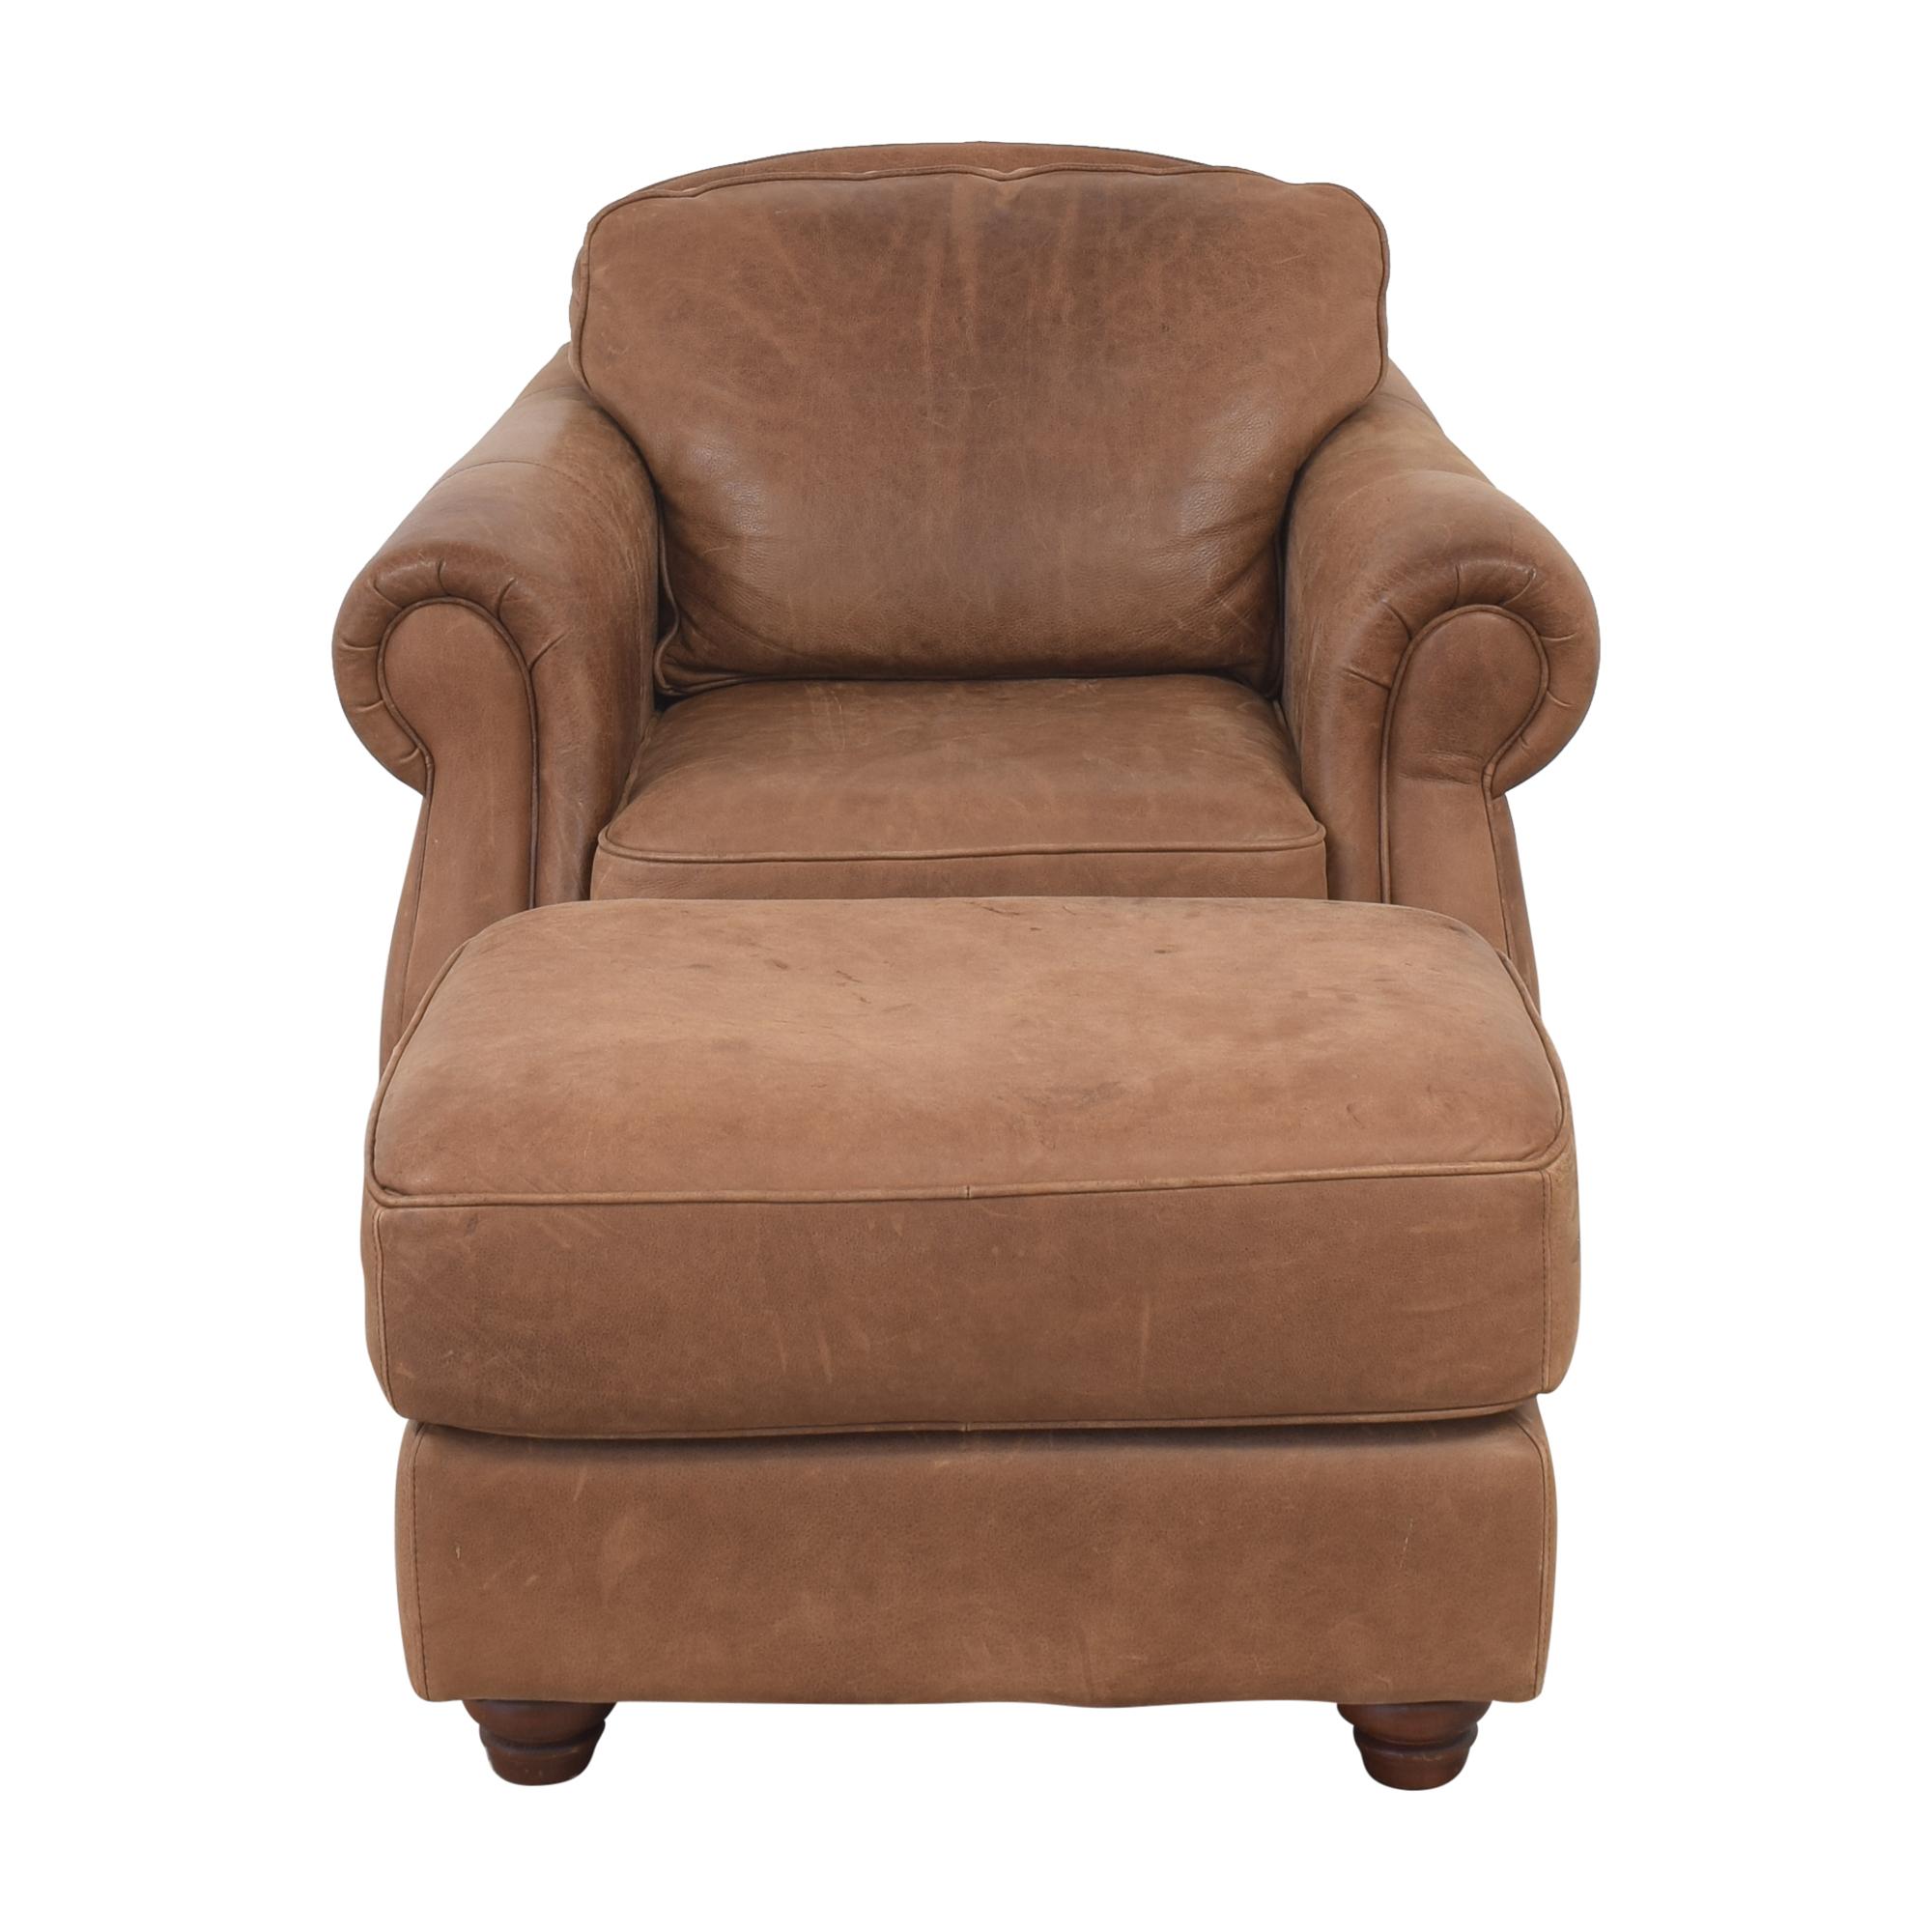 Domain Home Domain Home Fashions Club Chair and Ottoman ct